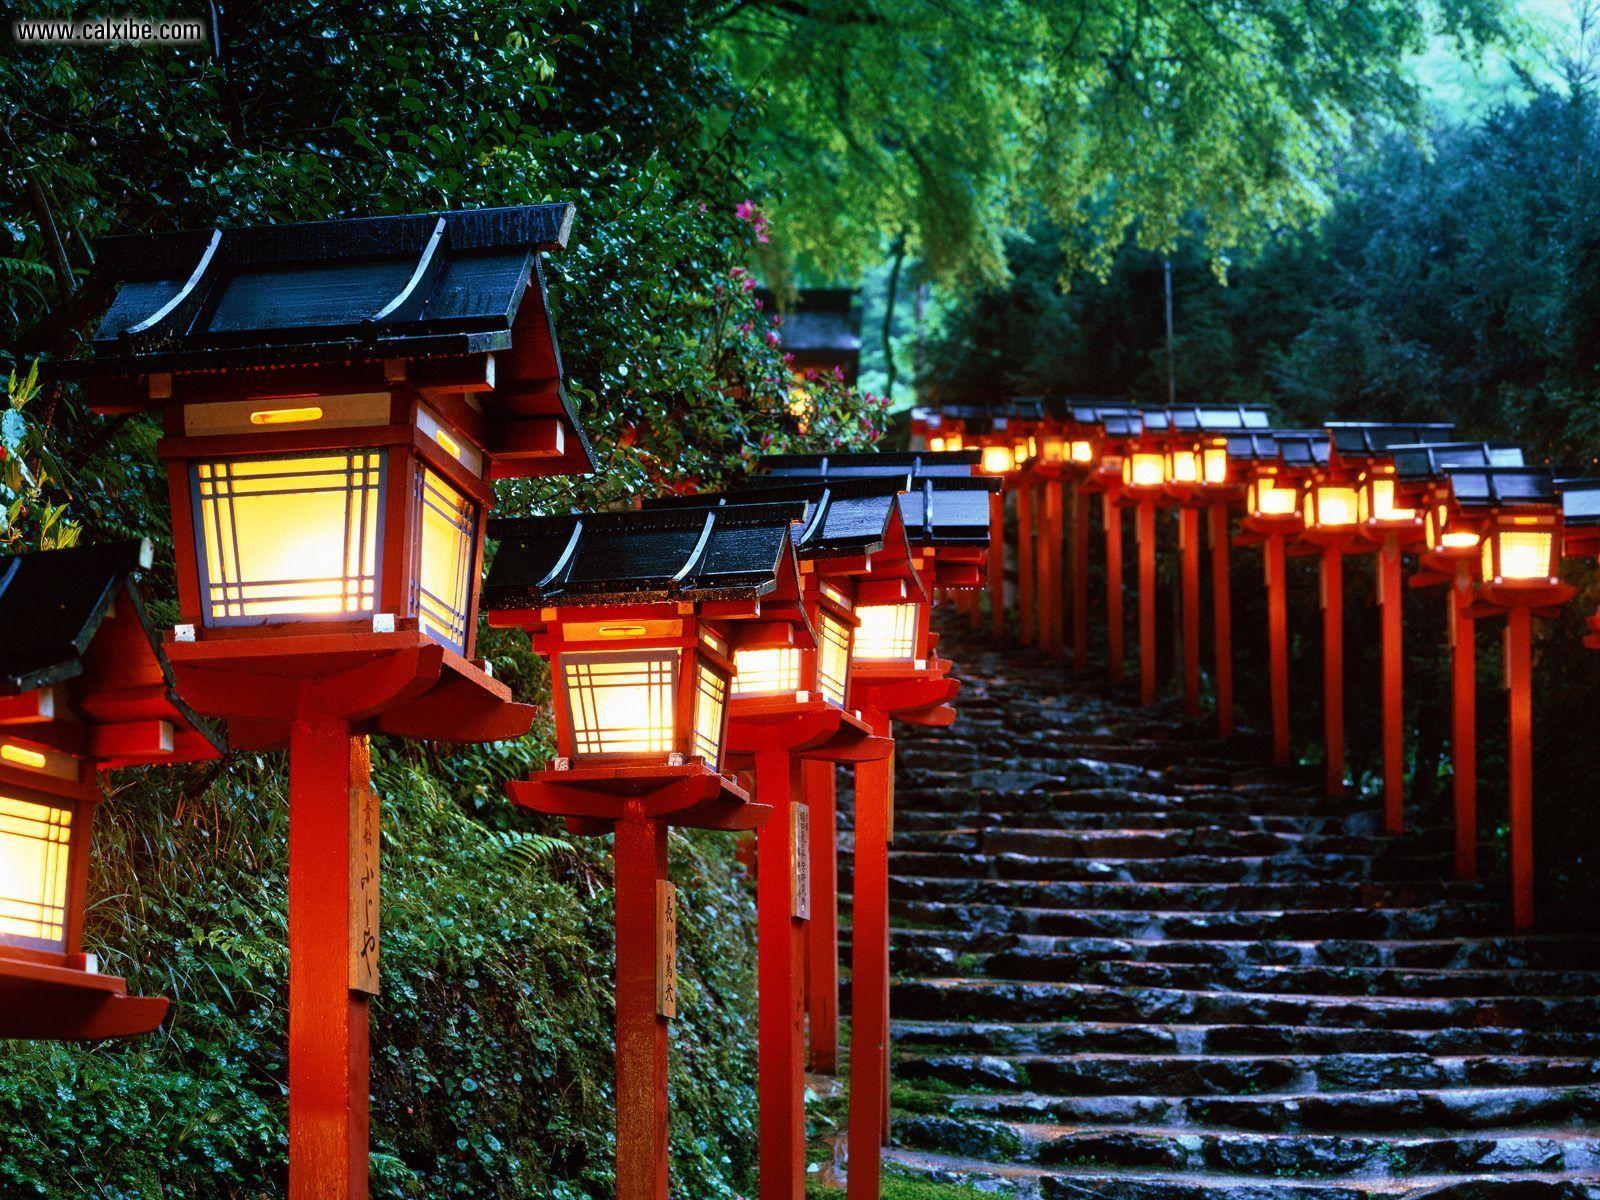 Known places Kibune Shrine Kyoto Japan desktop wallpaper nr 4213 1600x1200